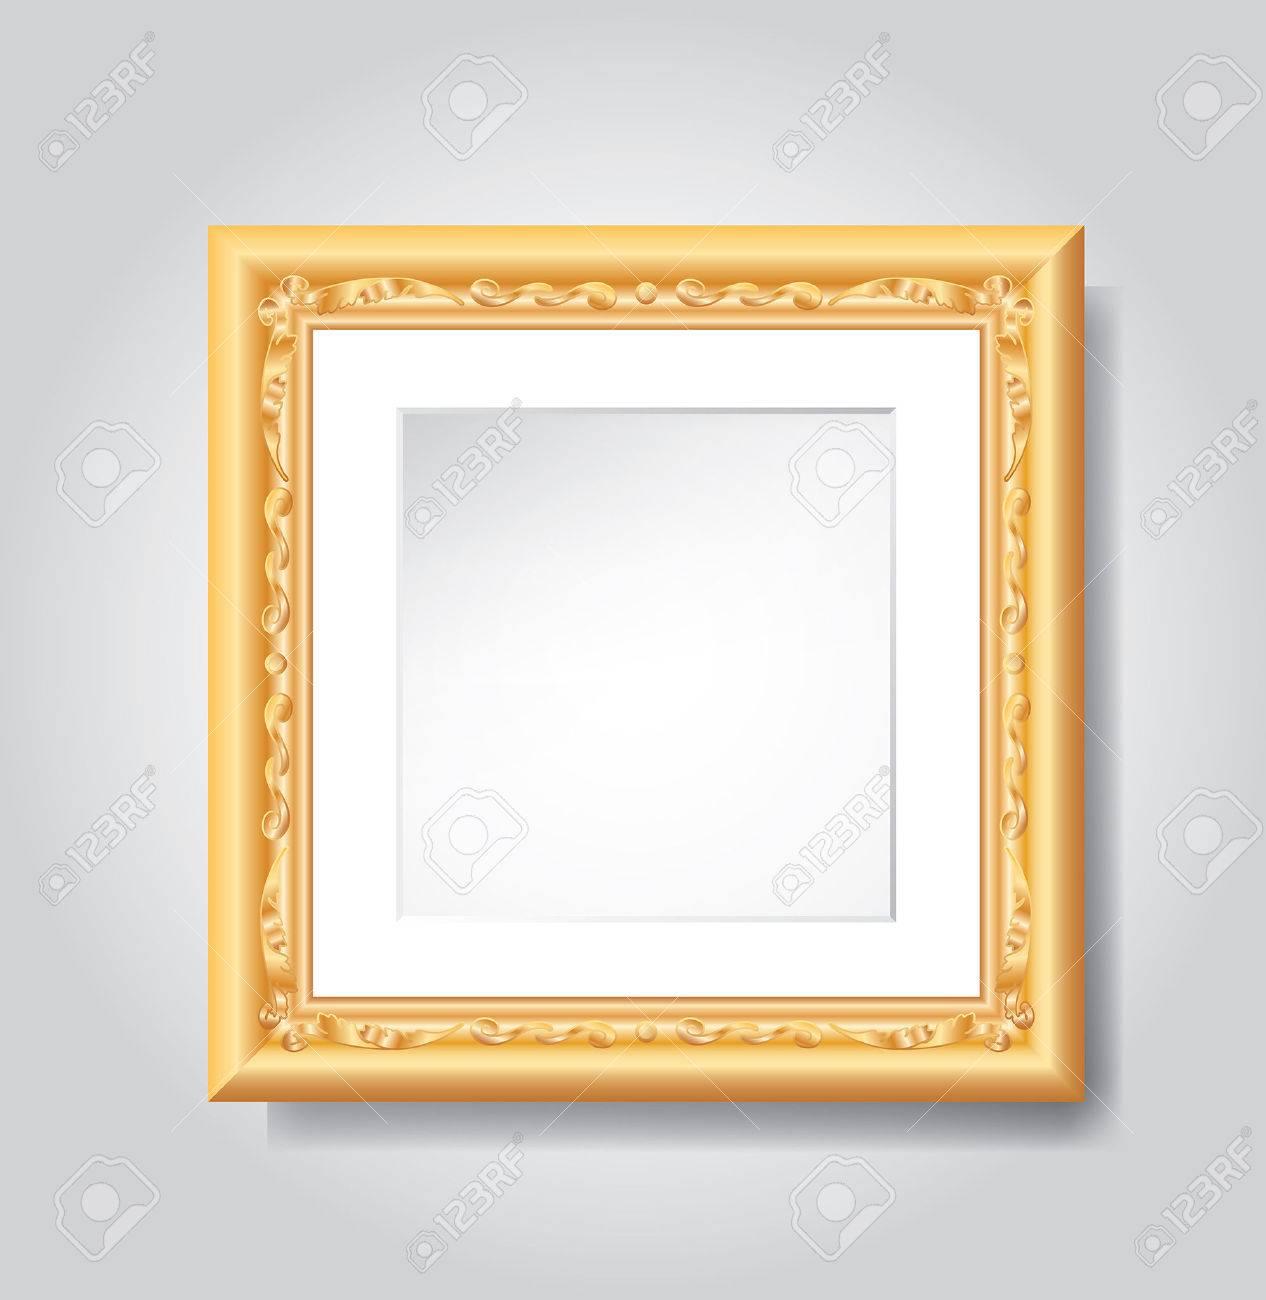 vector vintage golden frame on white wall - 34659909